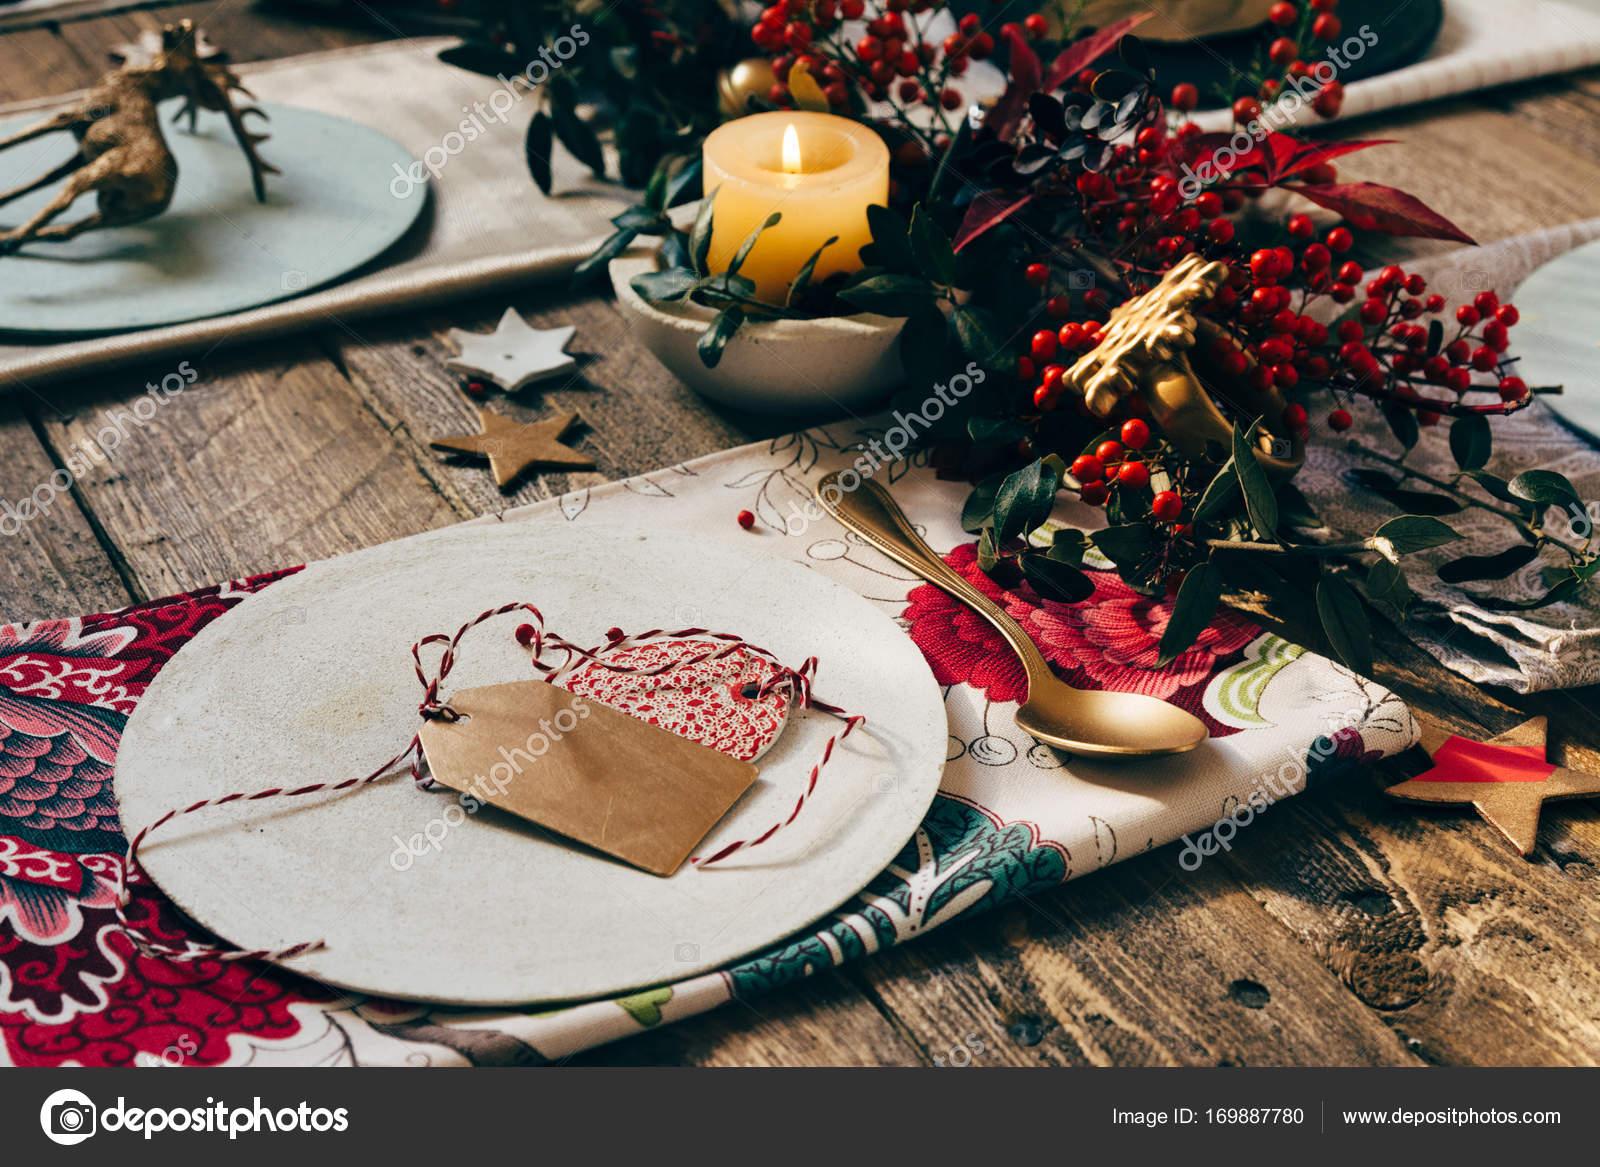 Christmas Place Setting, Name Card And Rustic Christmas Table Wi U2014 Stock  Photo